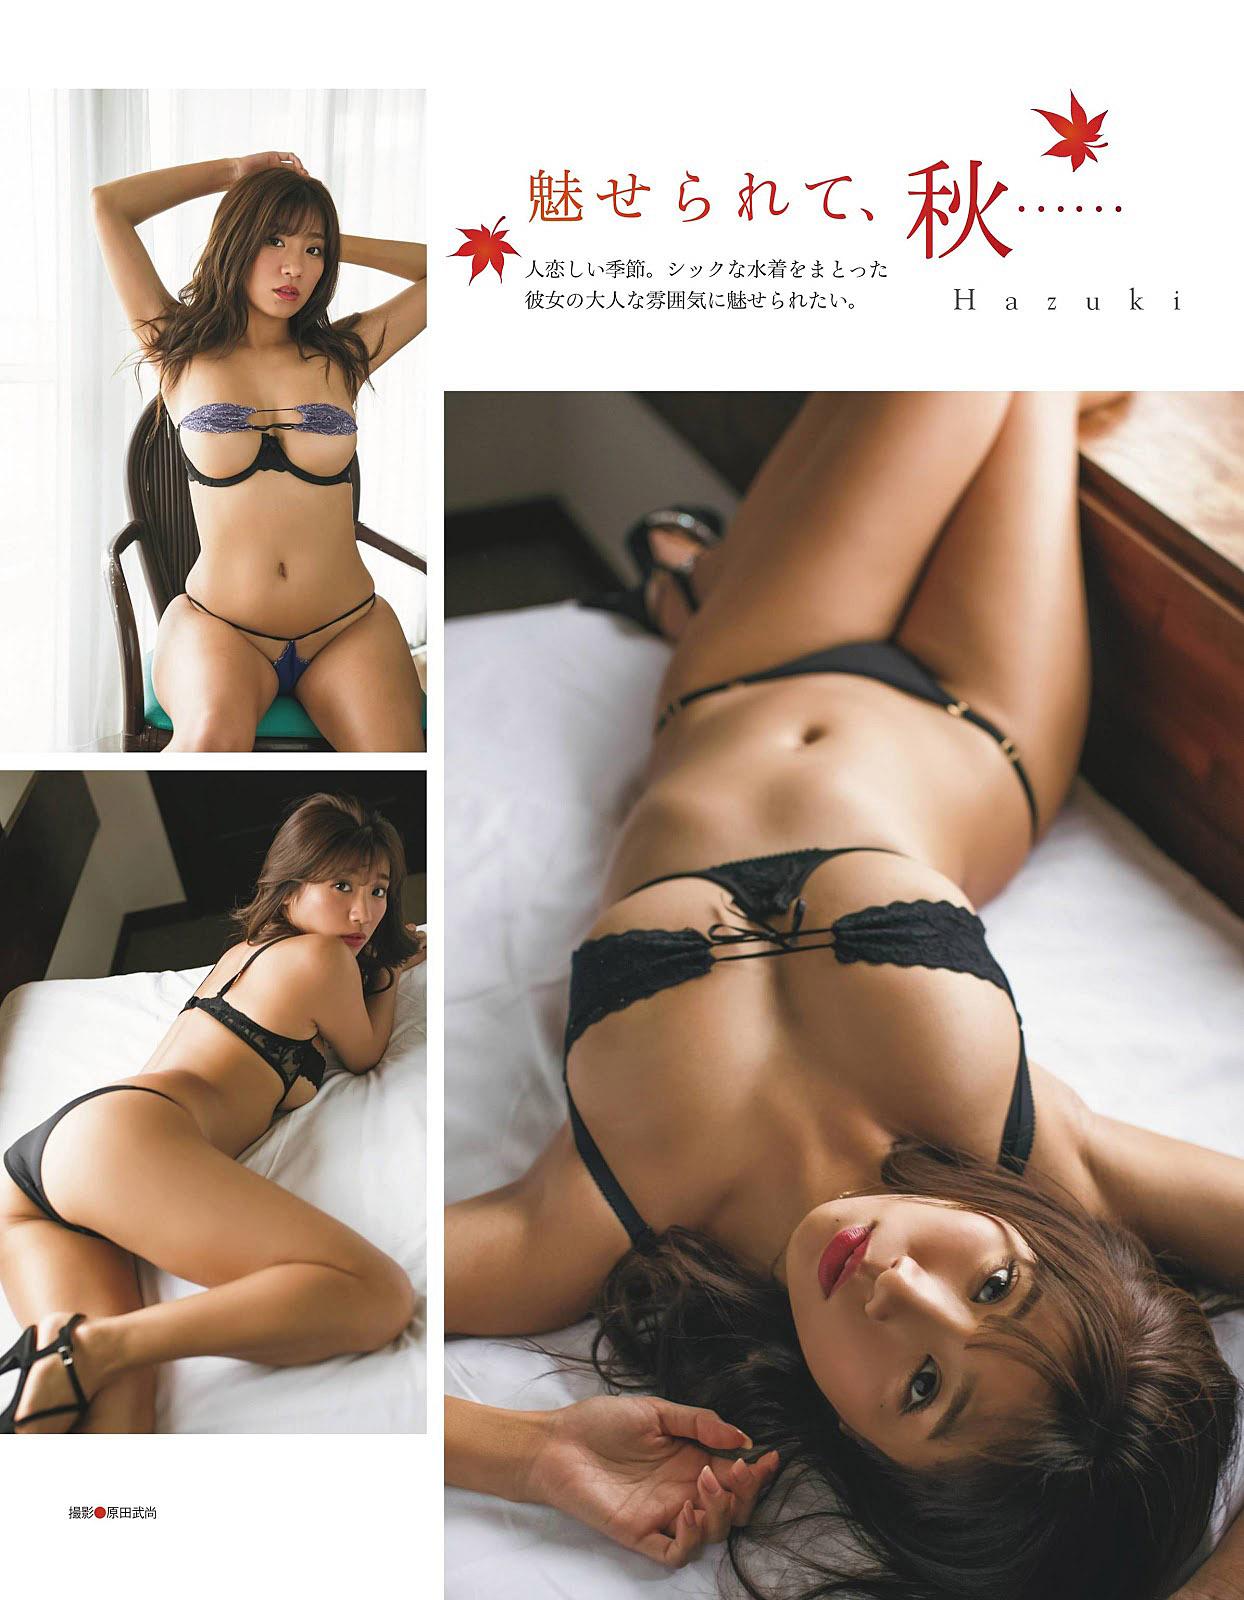 Aya Hazuki Ex-Taishu 1911 02.jpg